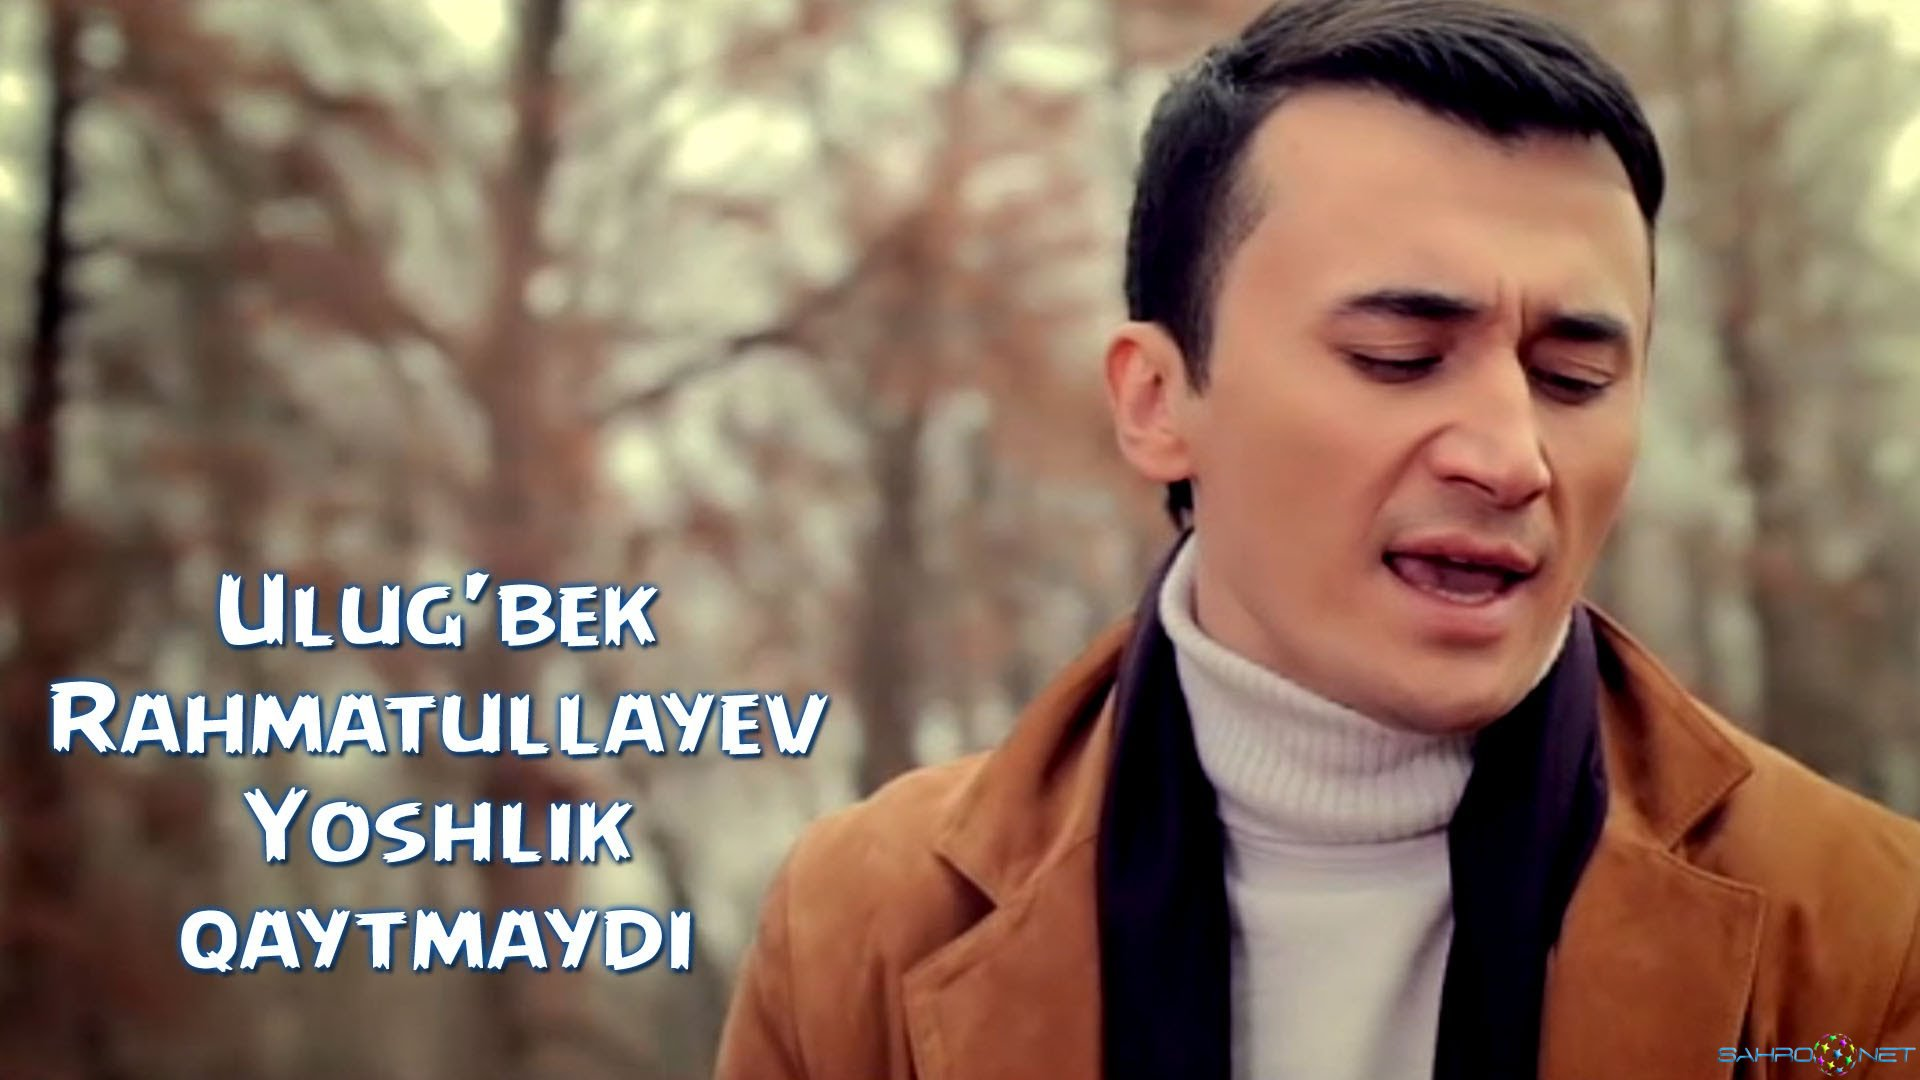 Ulug'bek Rahmatullayev 2015 - Yoshlik Qaytmaydi 2015 Yangi Uzbek Klip 2015